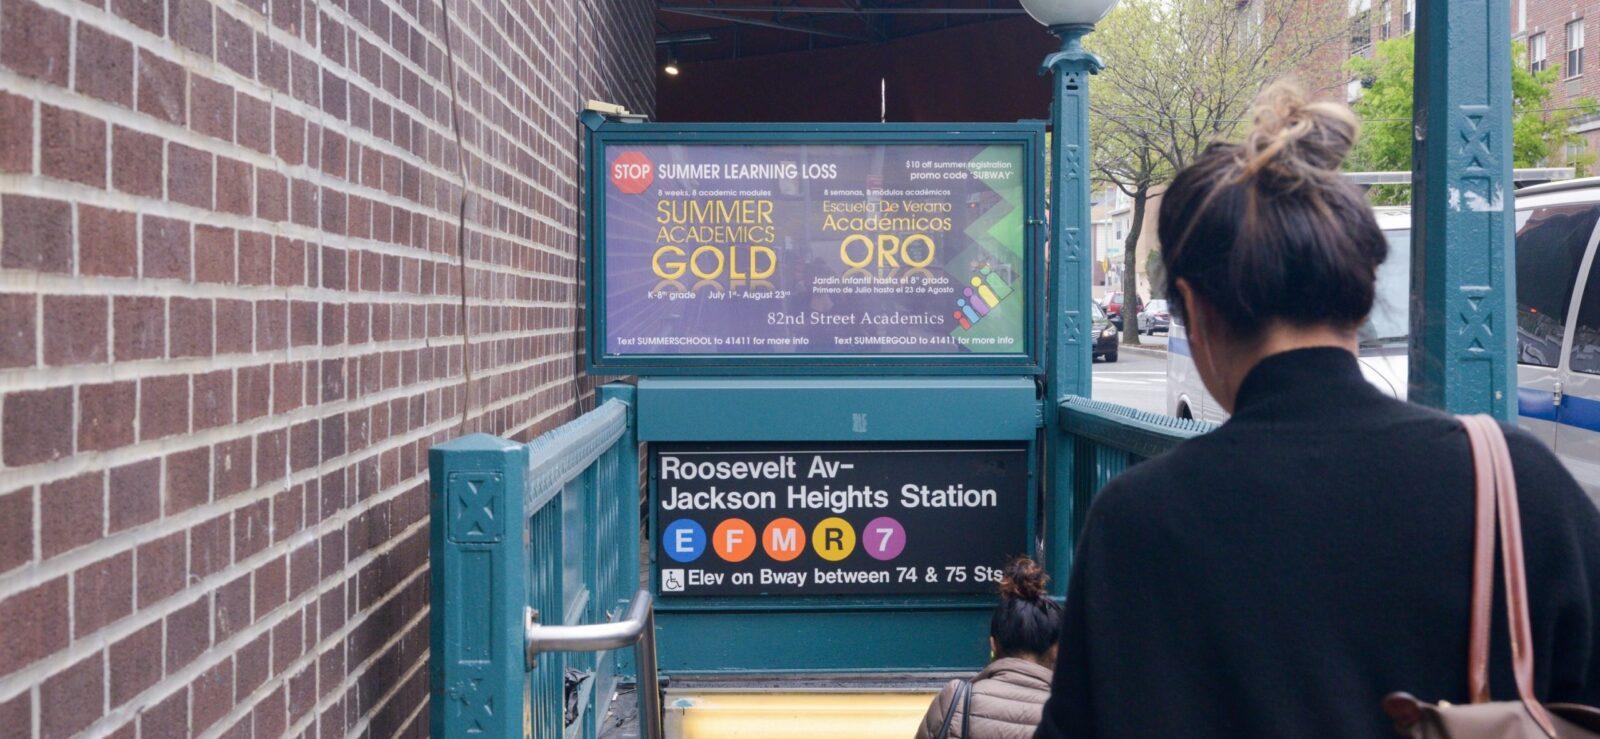 82nd Street Academics Subway Urban Panel Advertising